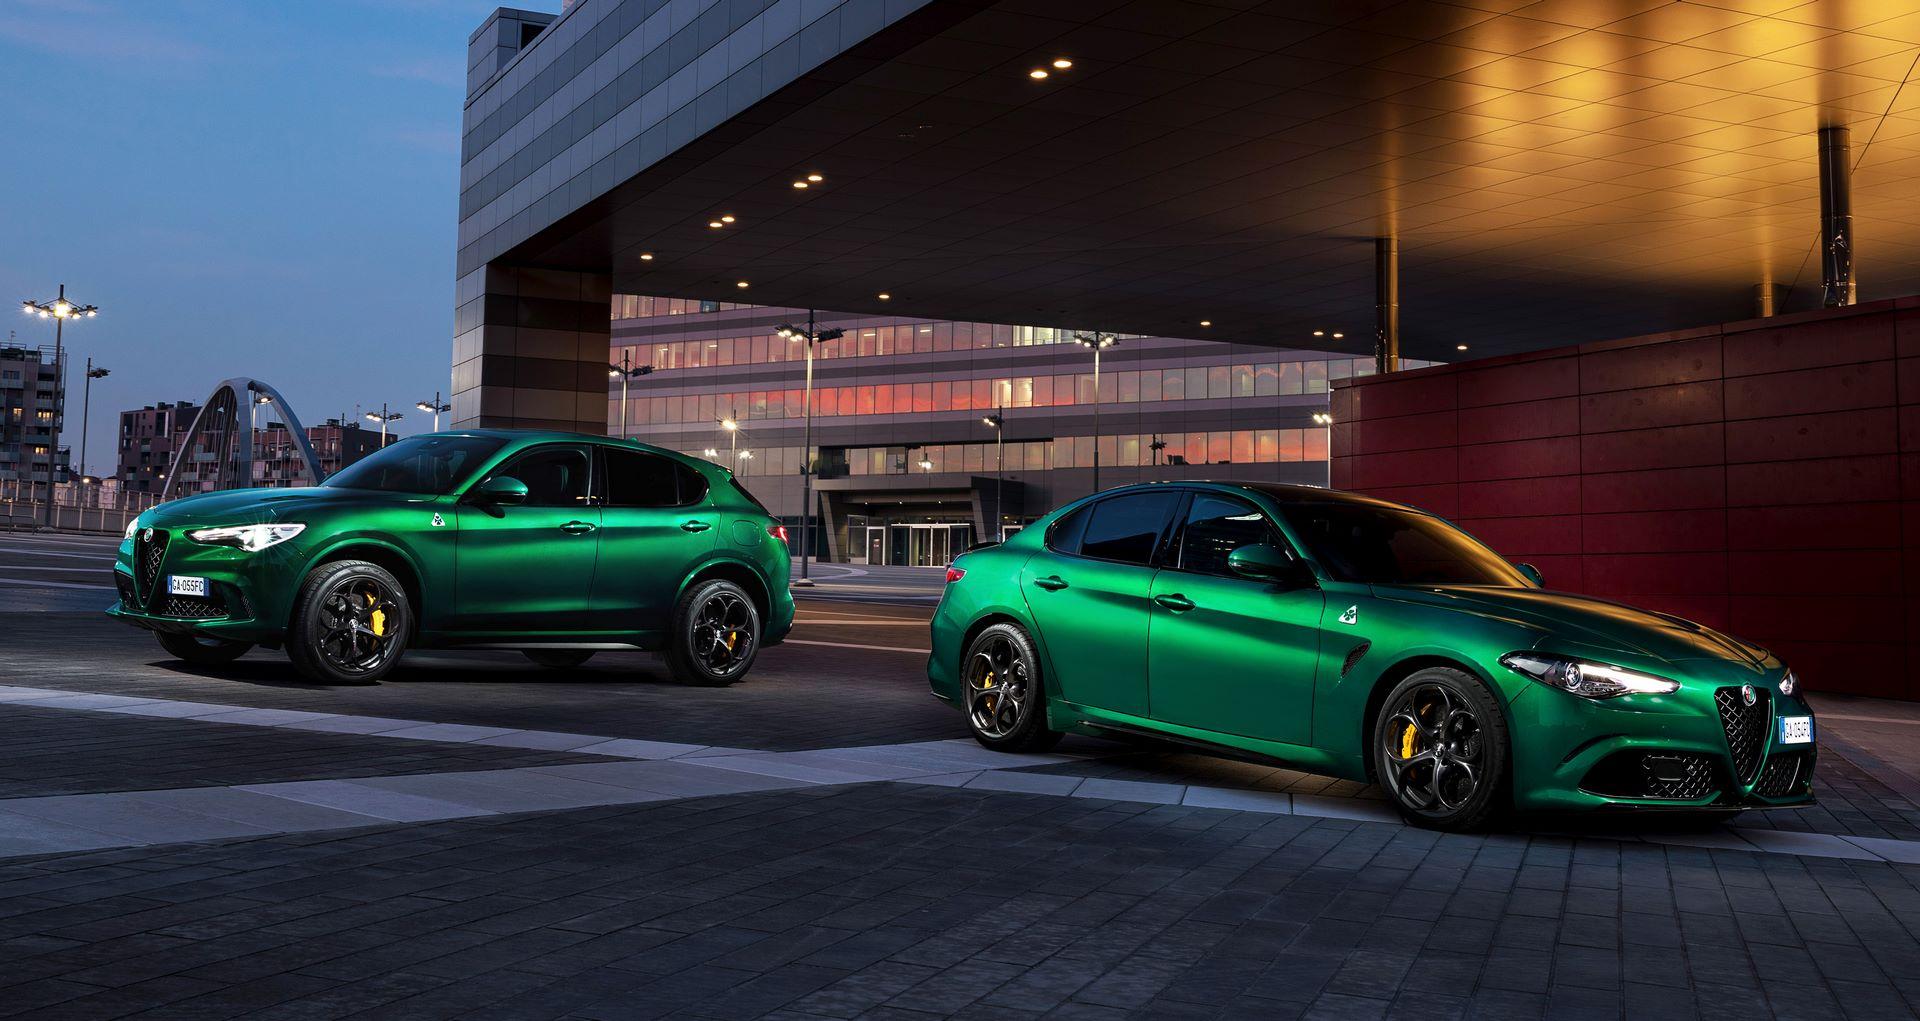 Alfa-Romeo-Giulia-Quadrifoglio-Stelvio-Quadrifoglio-facelift-2020-28